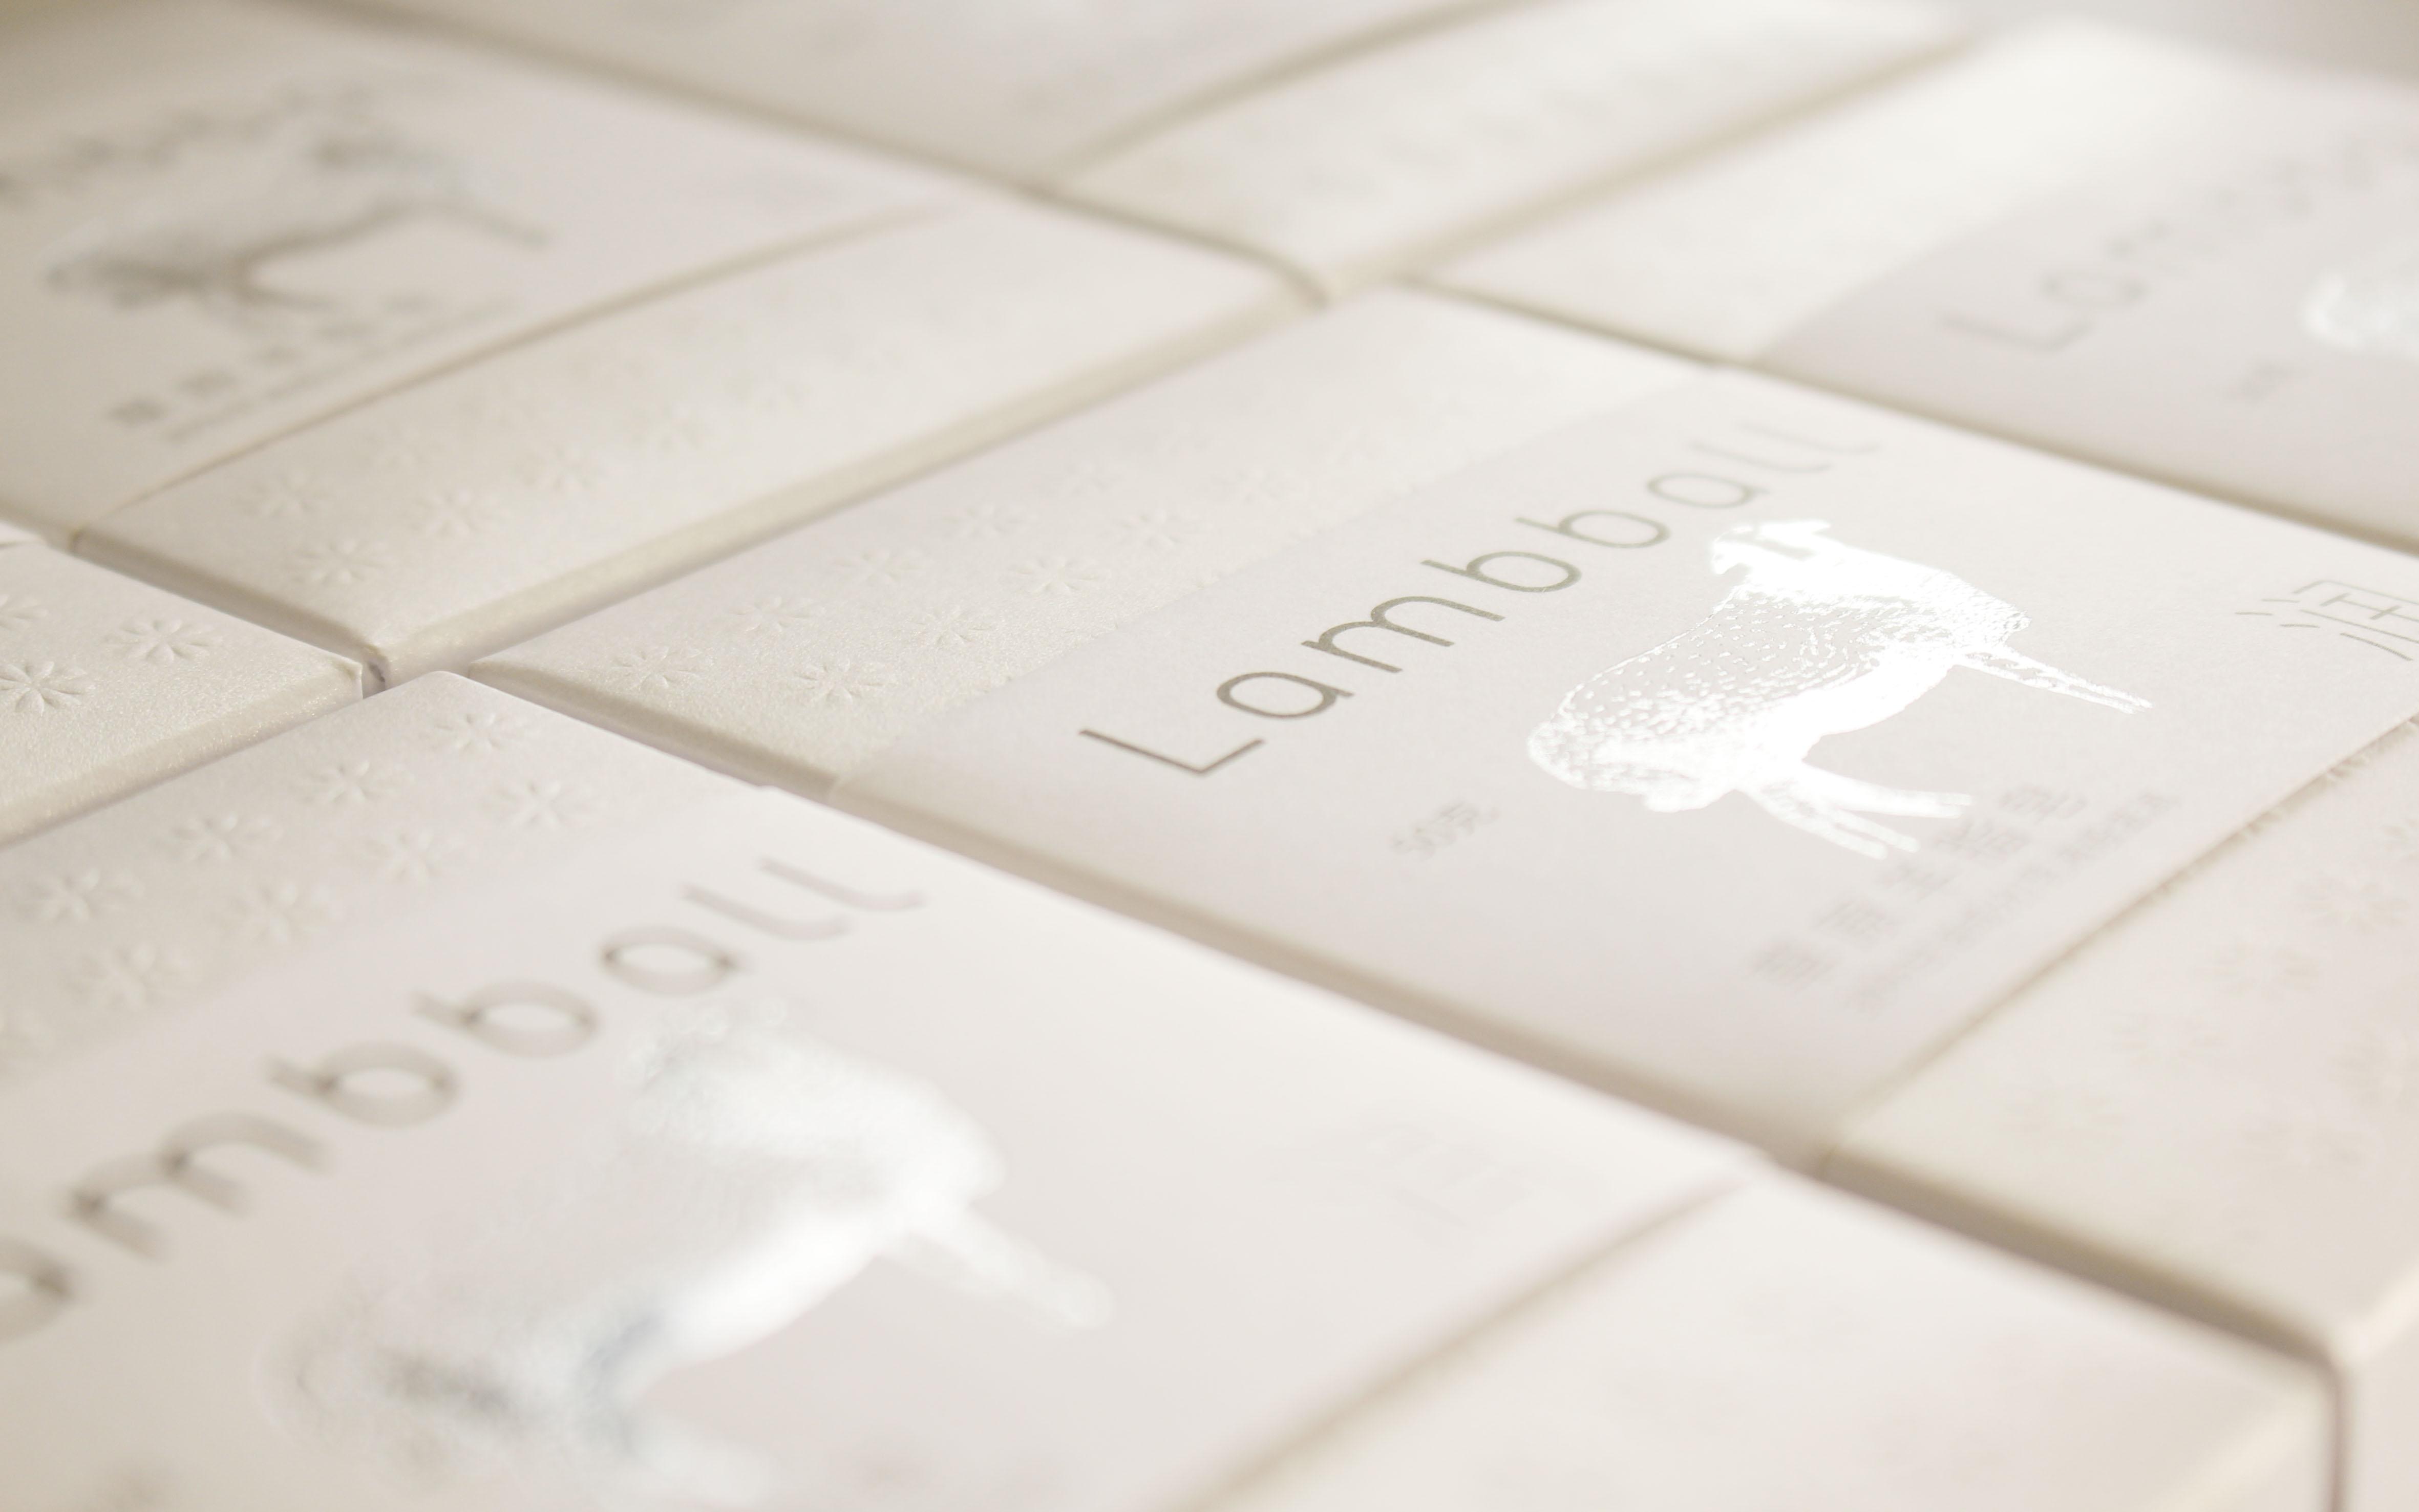 lambball羊脂皂包装设计 第18张 lambball羊脂皂包装设计 蒙古设计